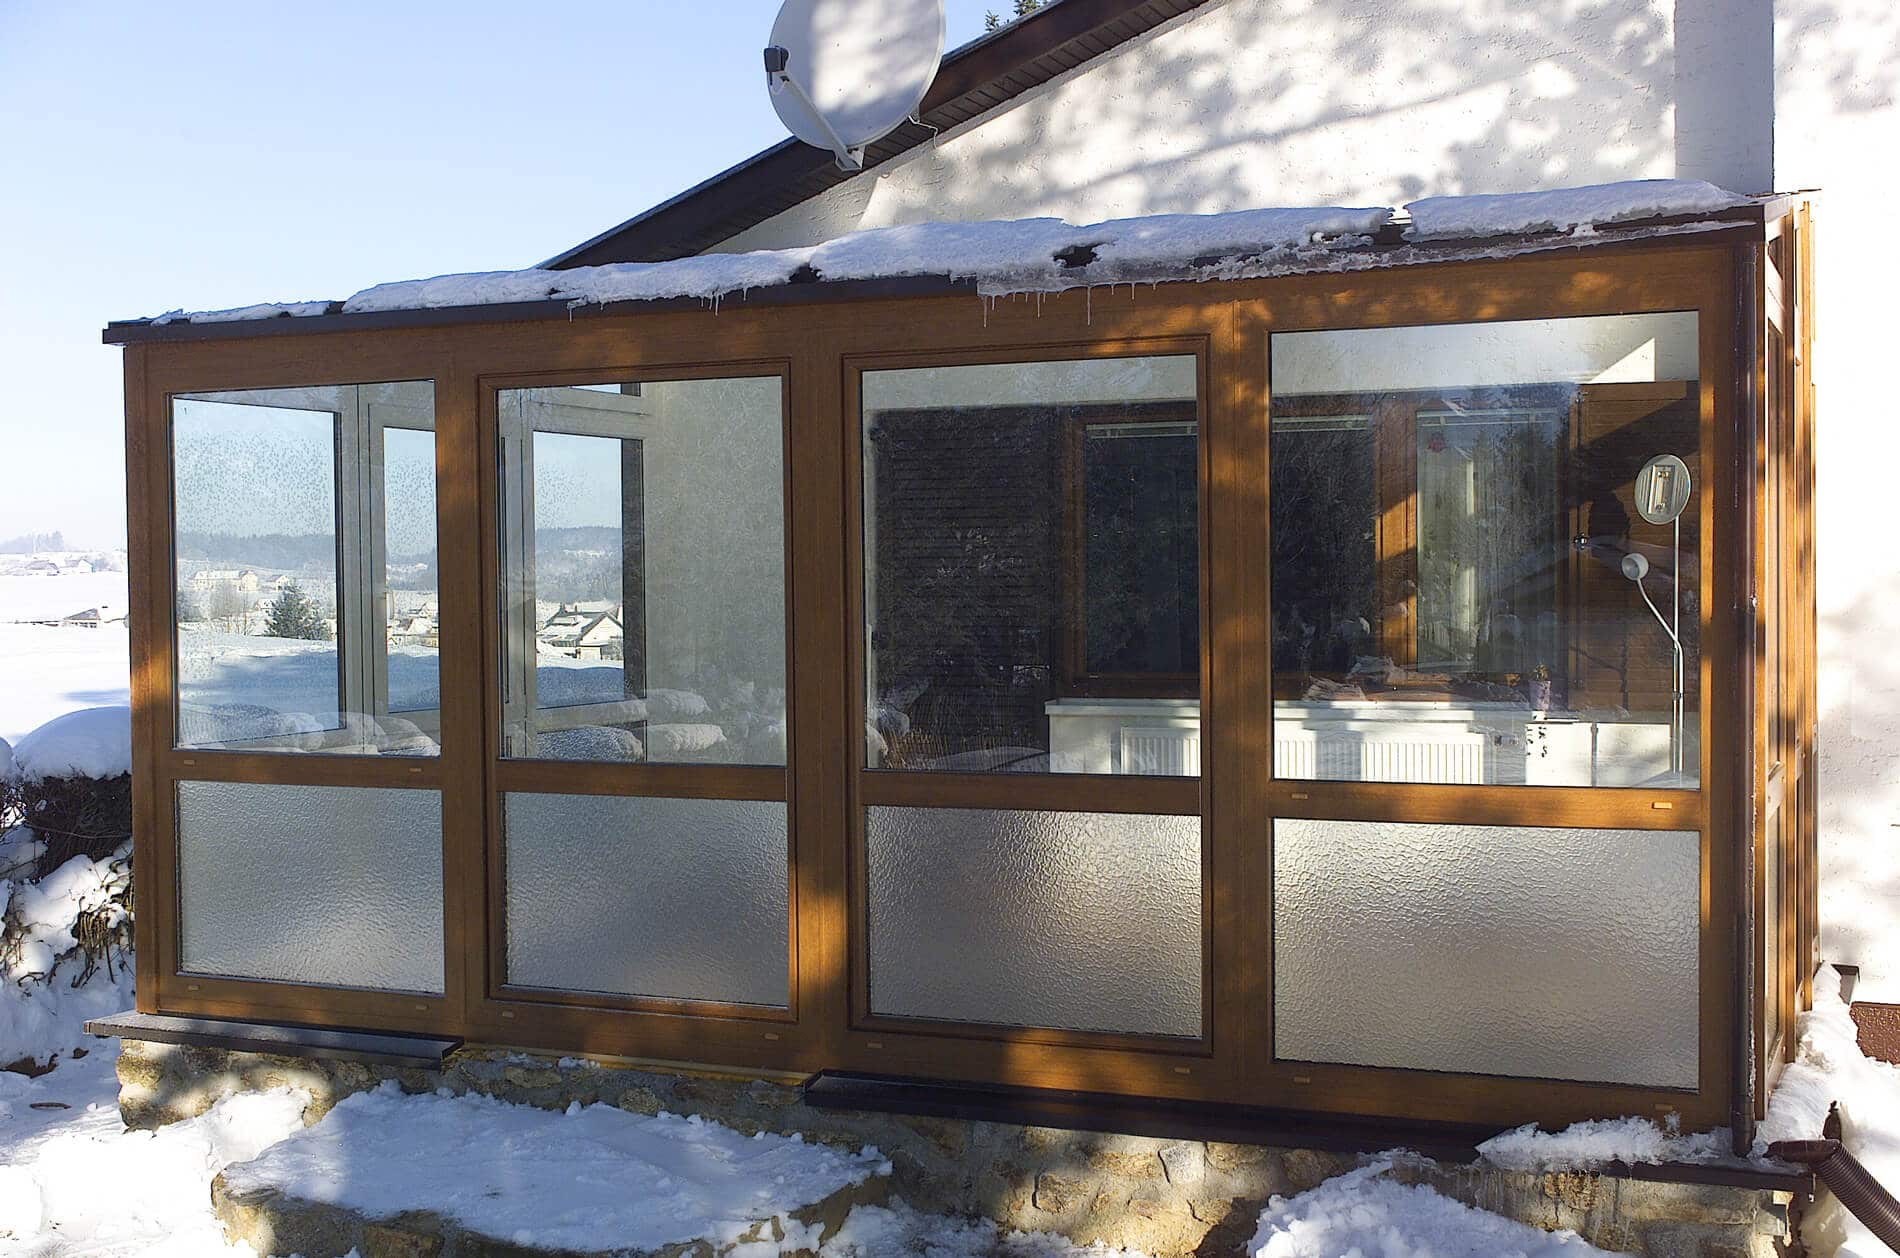 glasoase mit schiebet ren wintergarten schmidinger. Black Bedroom Furniture Sets. Home Design Ideas